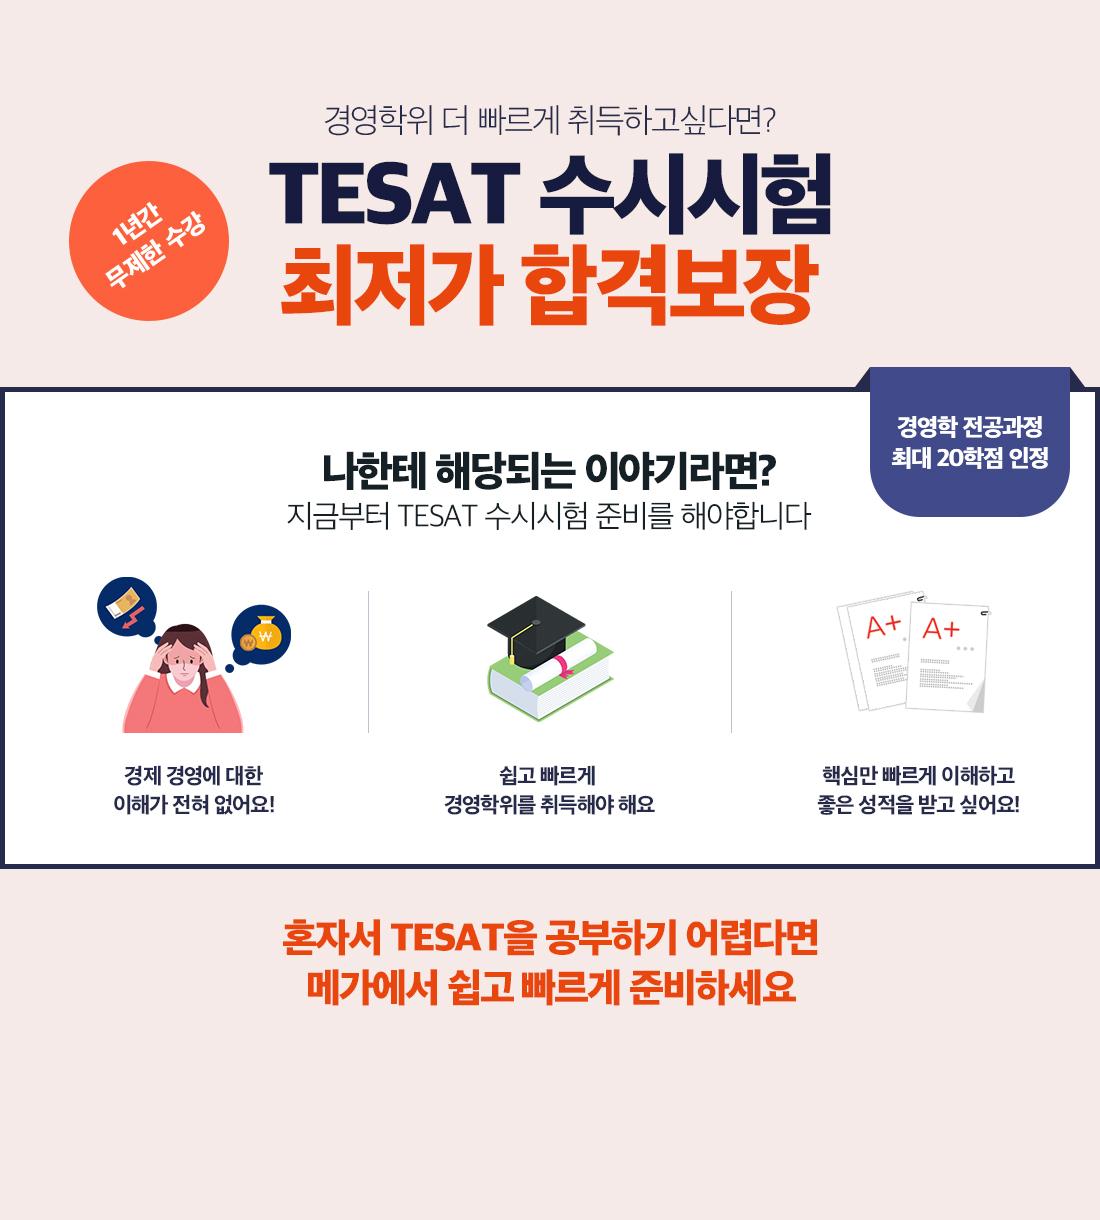 TESAT 특별시험 초단기 합격보장반